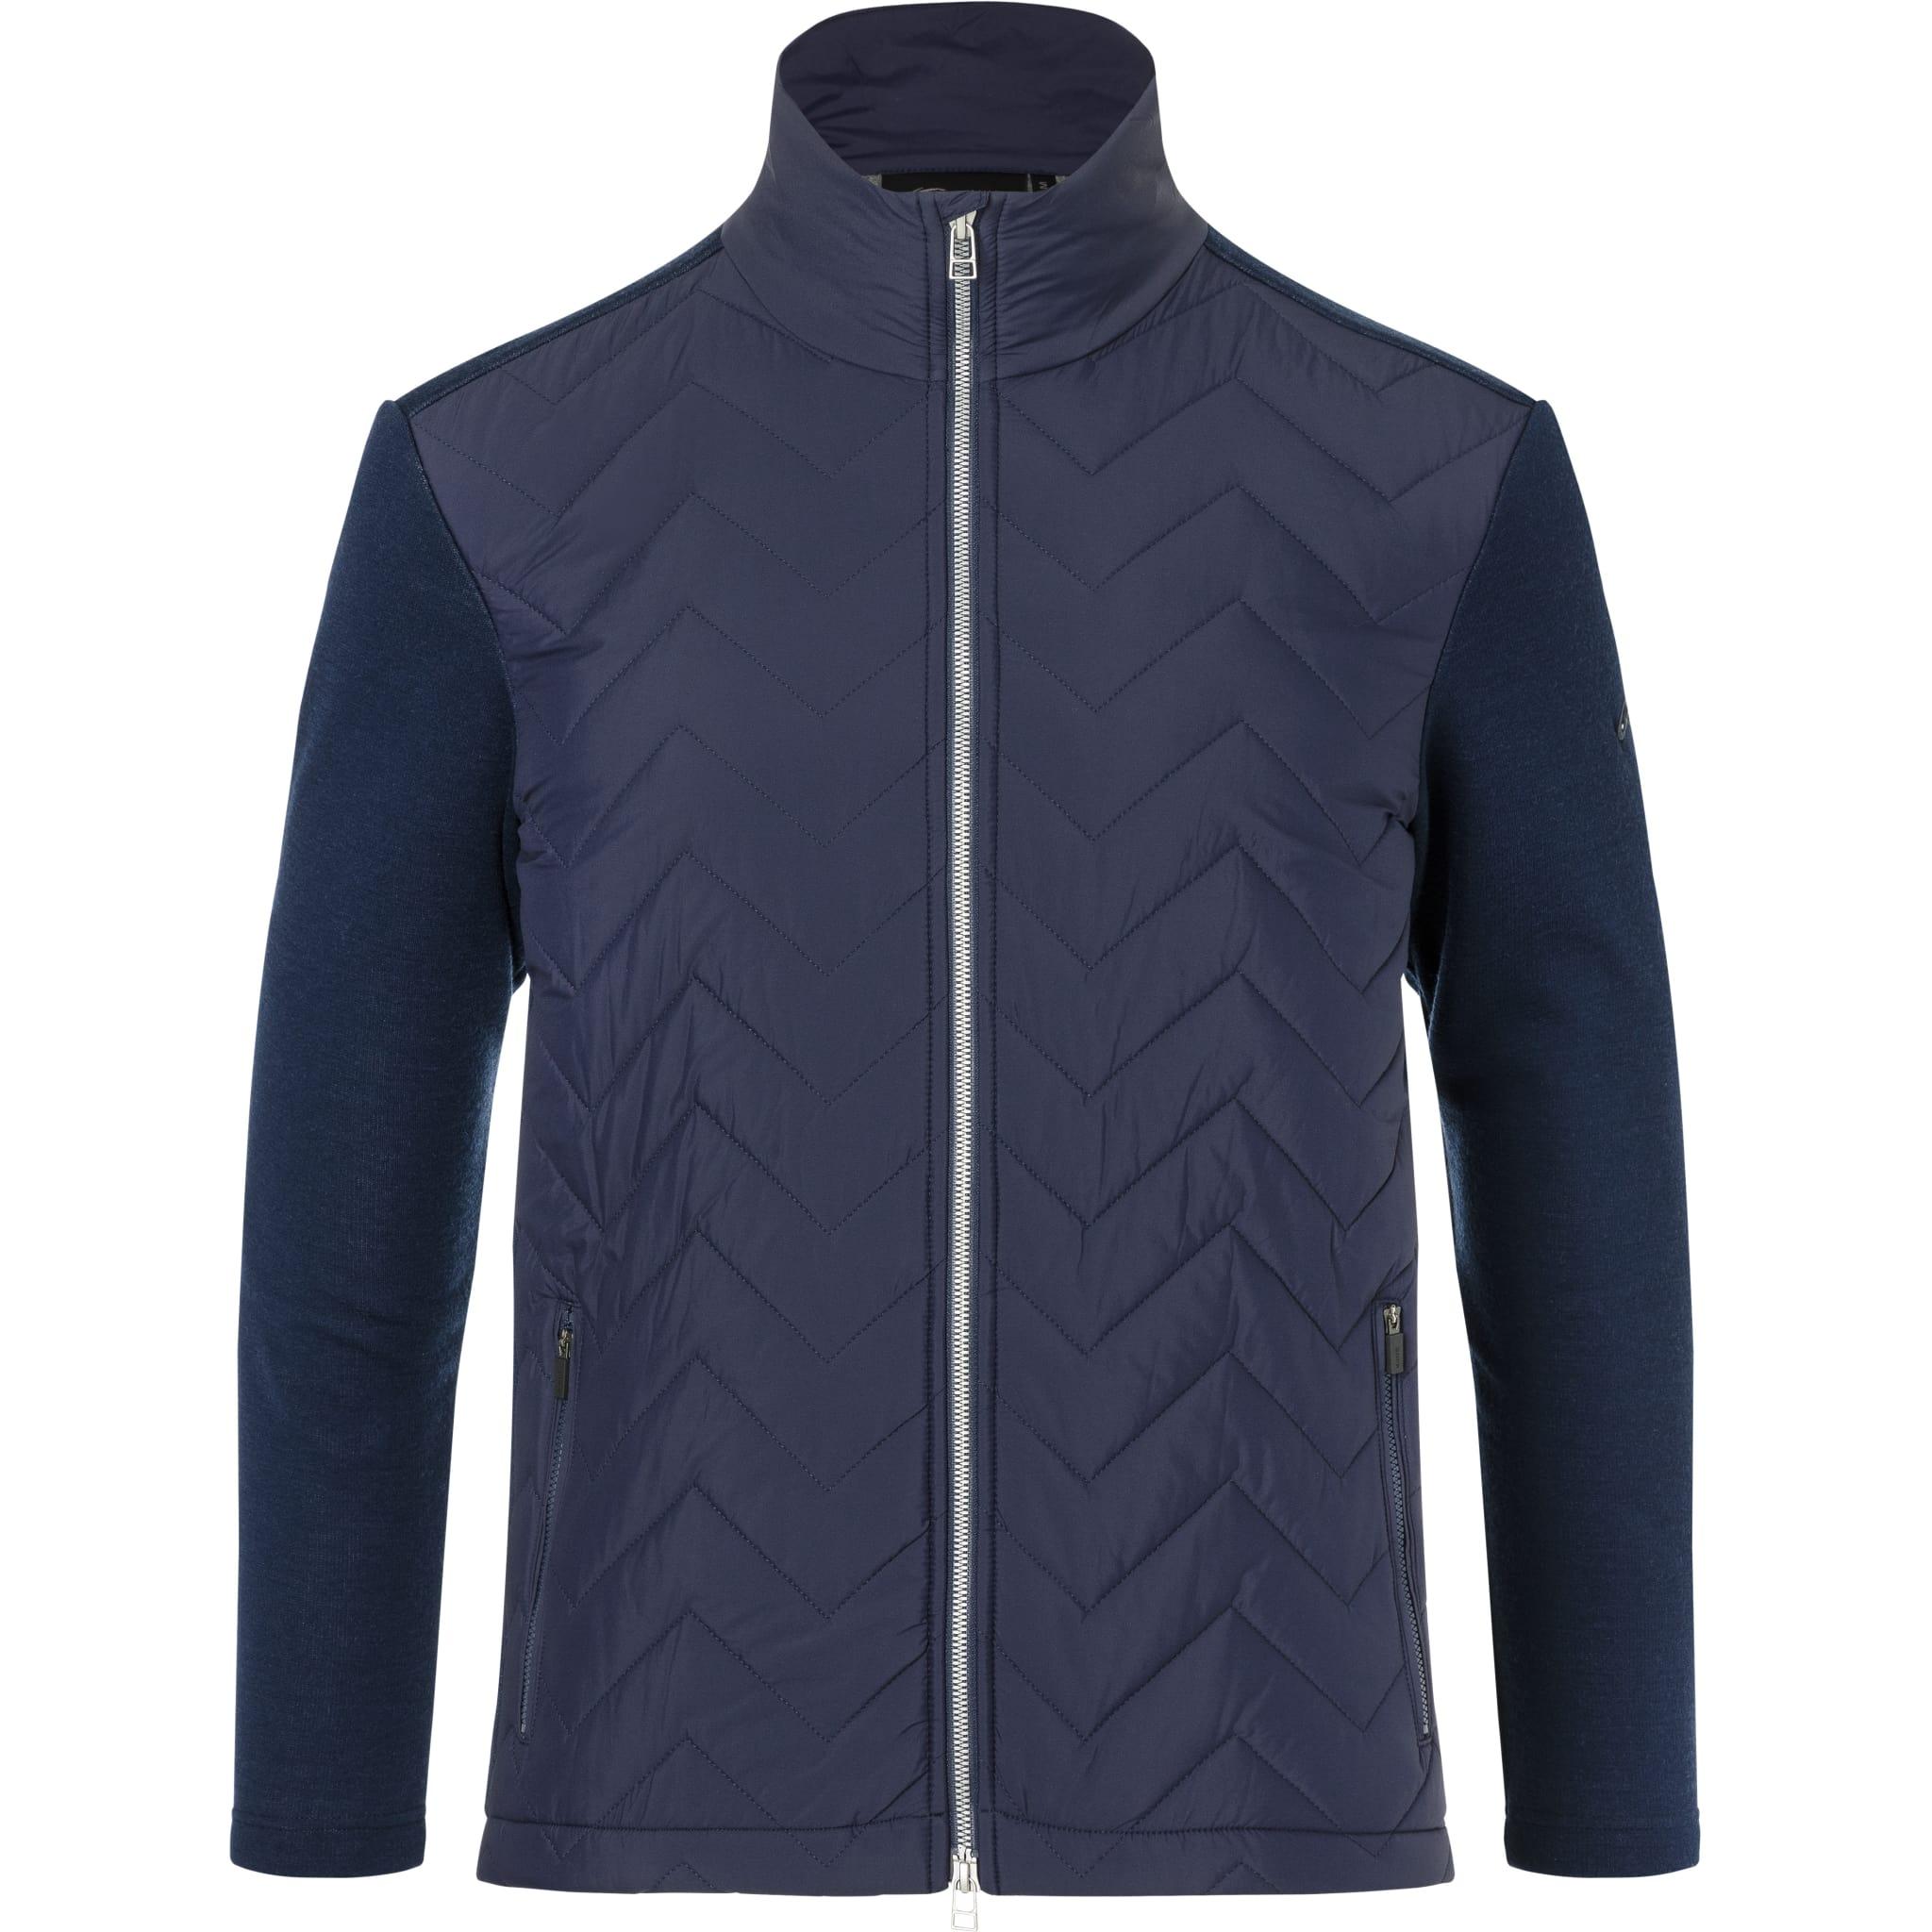 Linard Midlayer Jacket